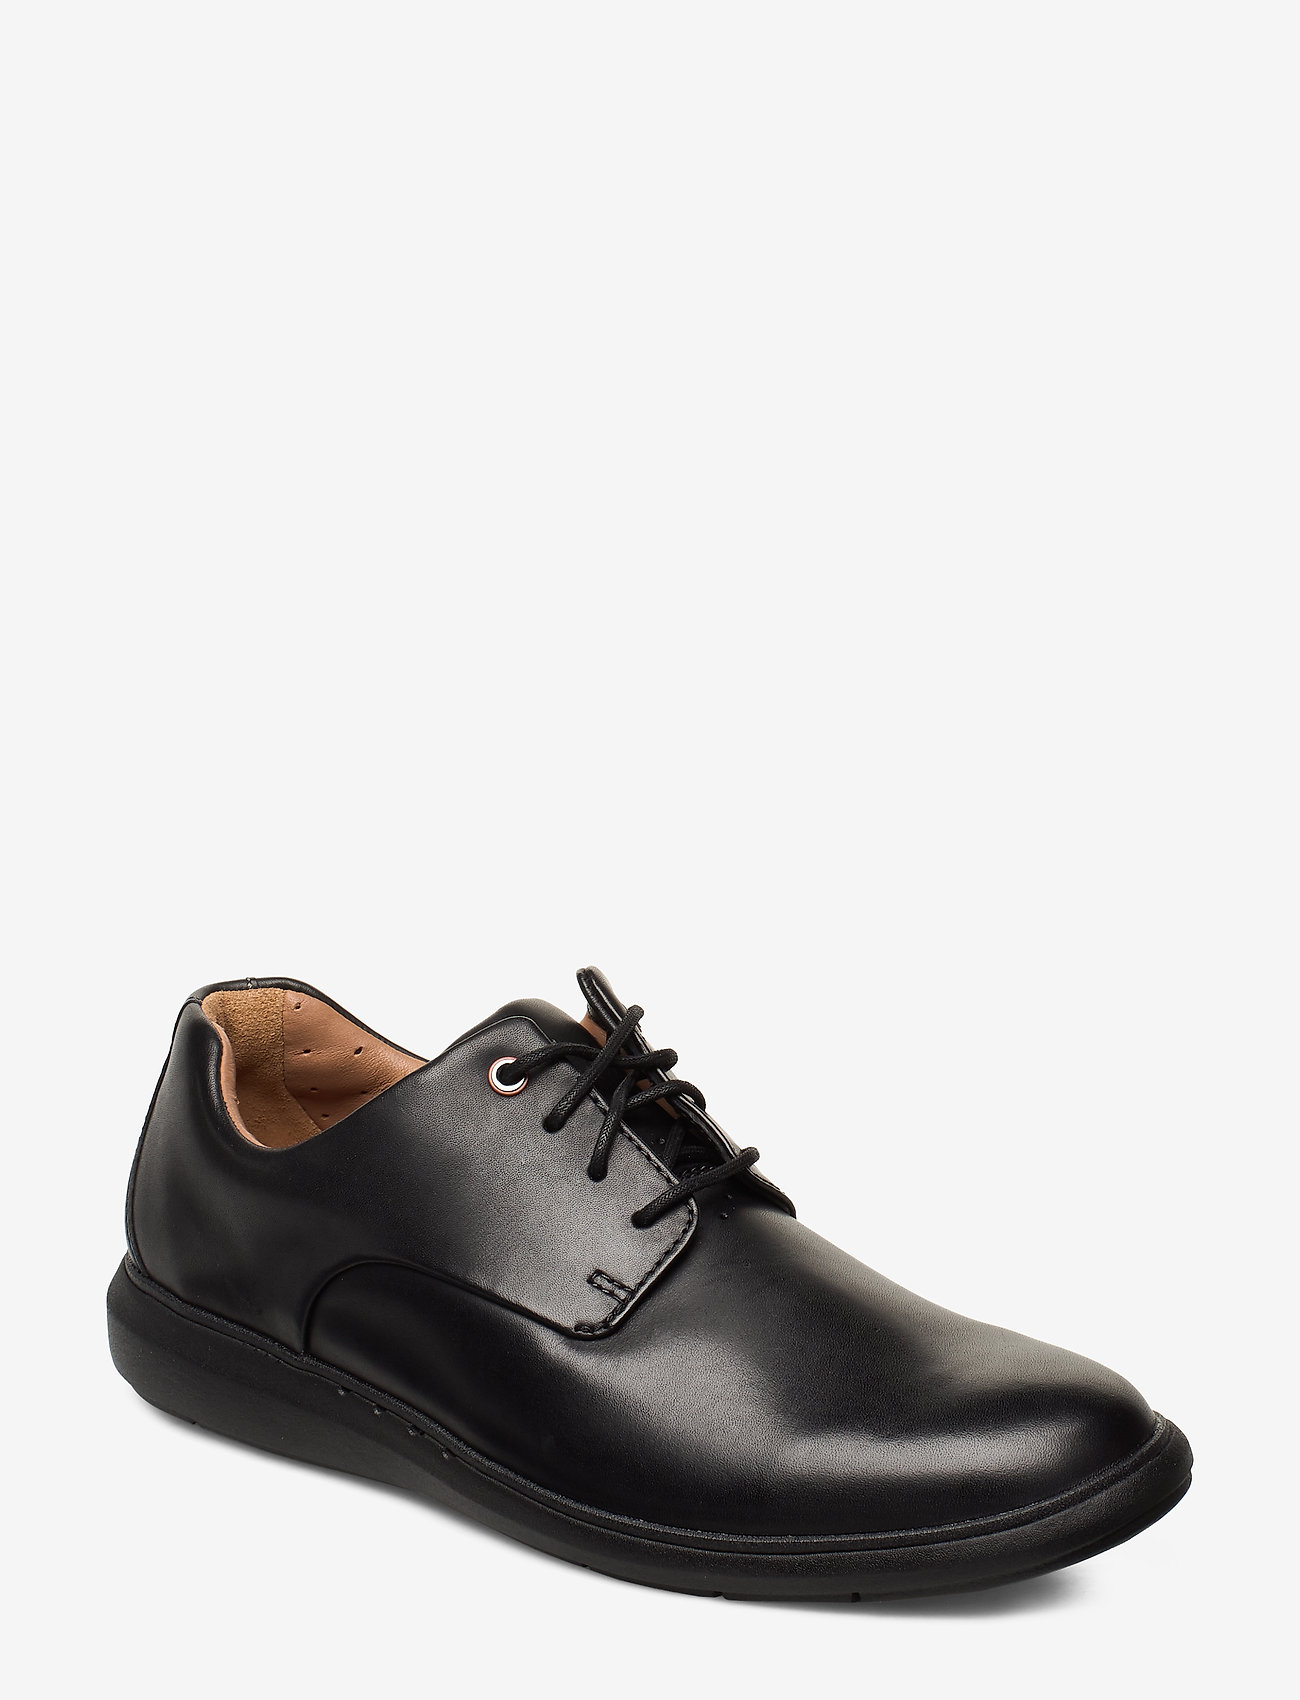 Clarks - Un VoyagePlain - buty ze skóry lakierowanej - black leather - 0